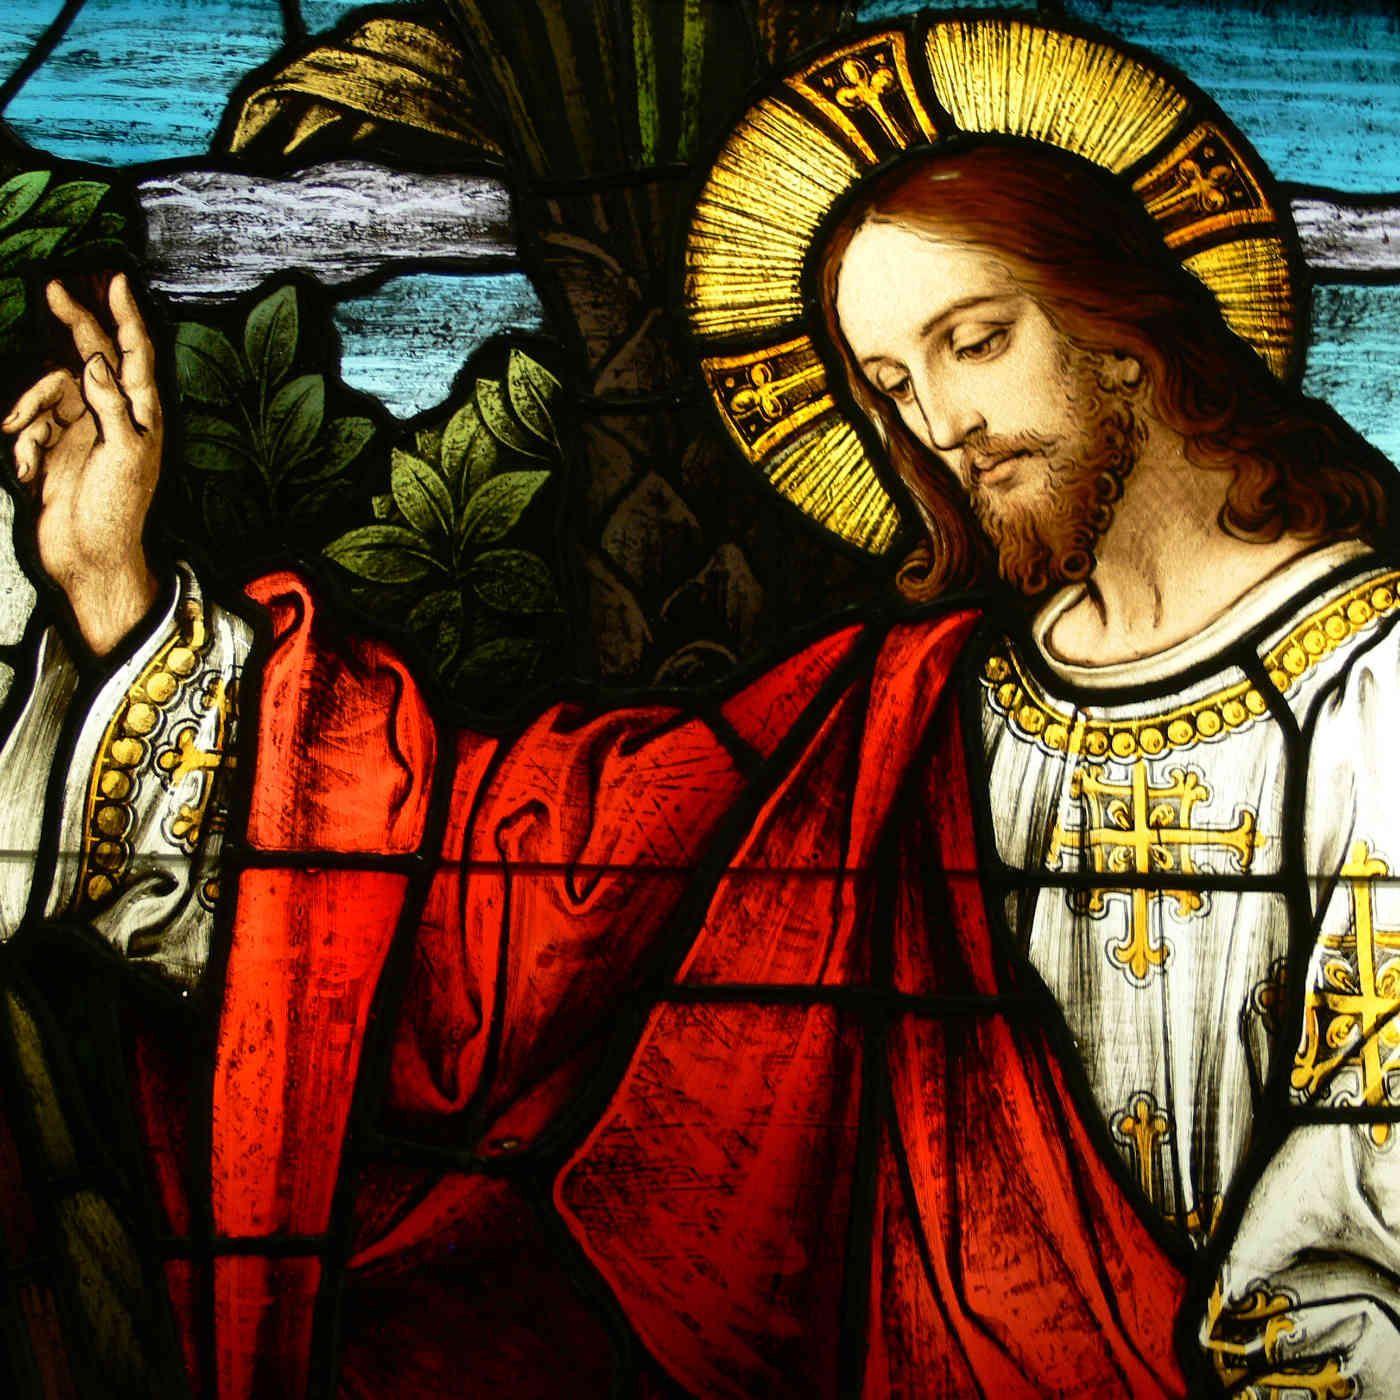 Feast of Saint Luke, Evangelist, October 18 - Evangelizing the World